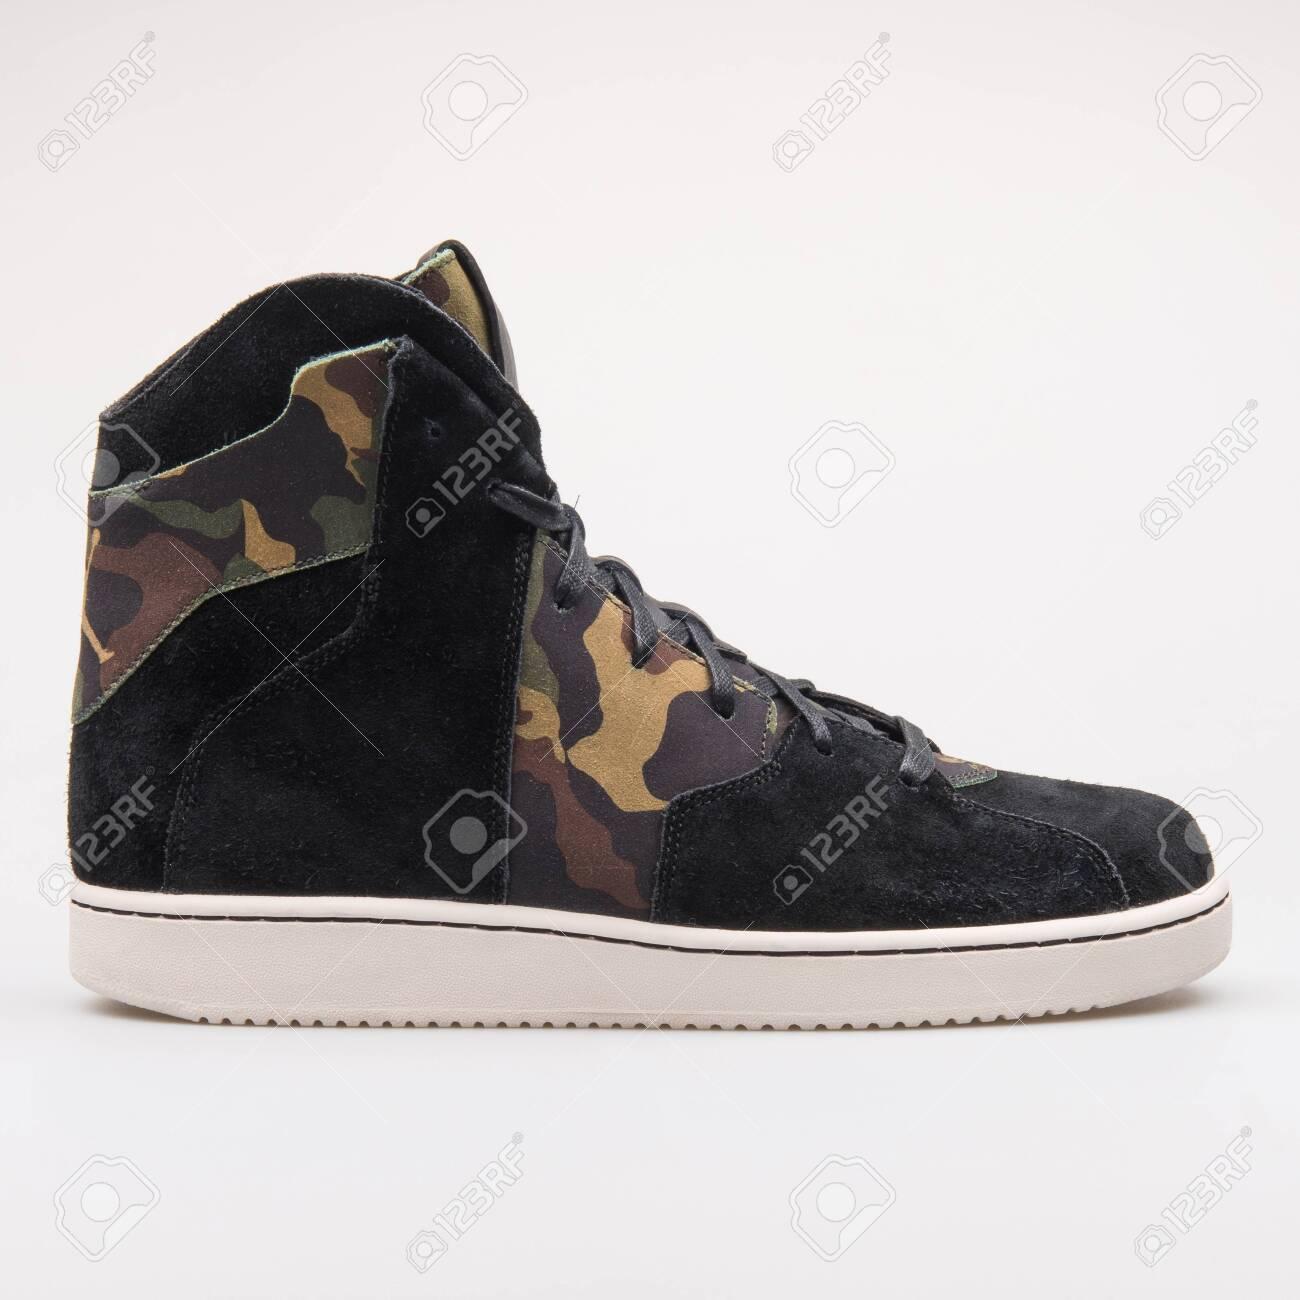 Nike Jordan Westbrook 0.2.. Stock Photo